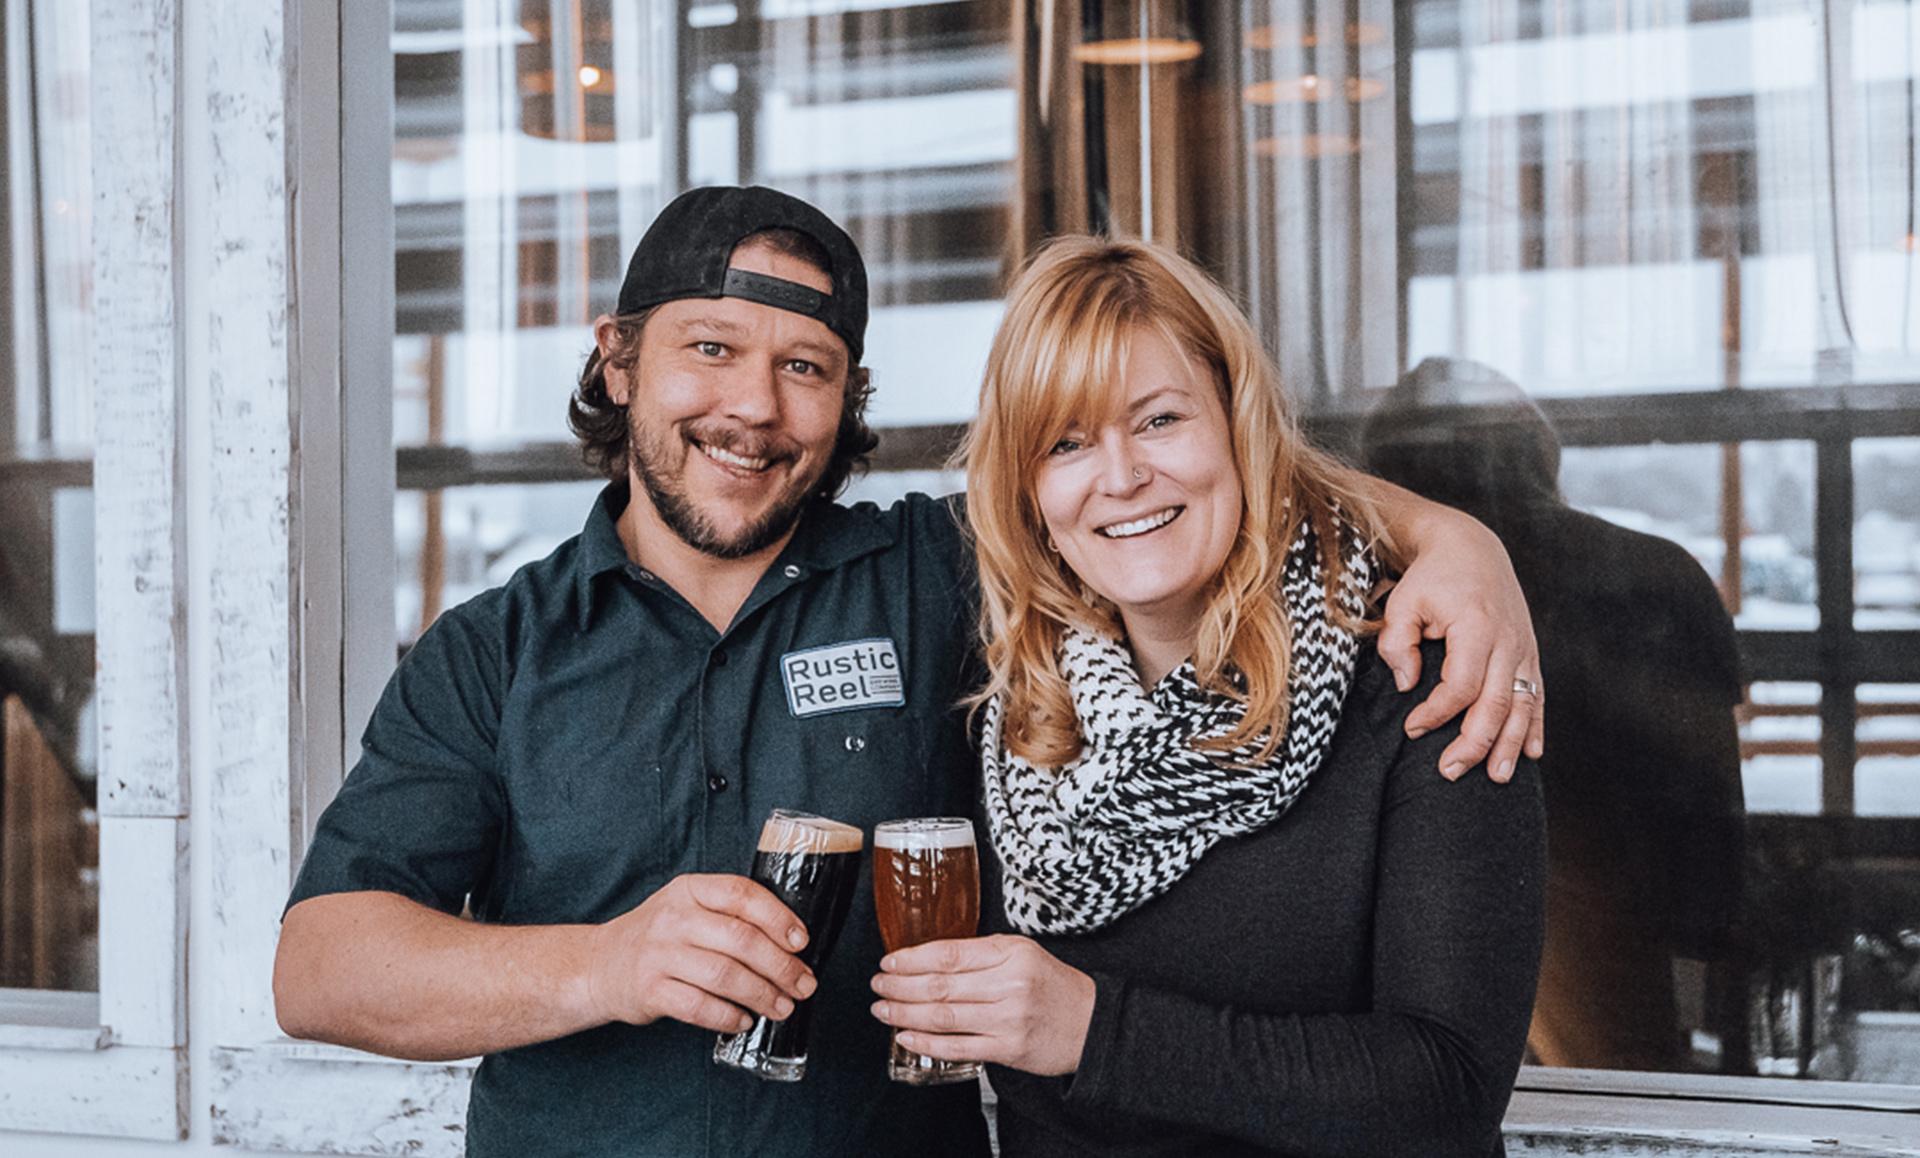 kelowna brewery marketing owner and staff cheers